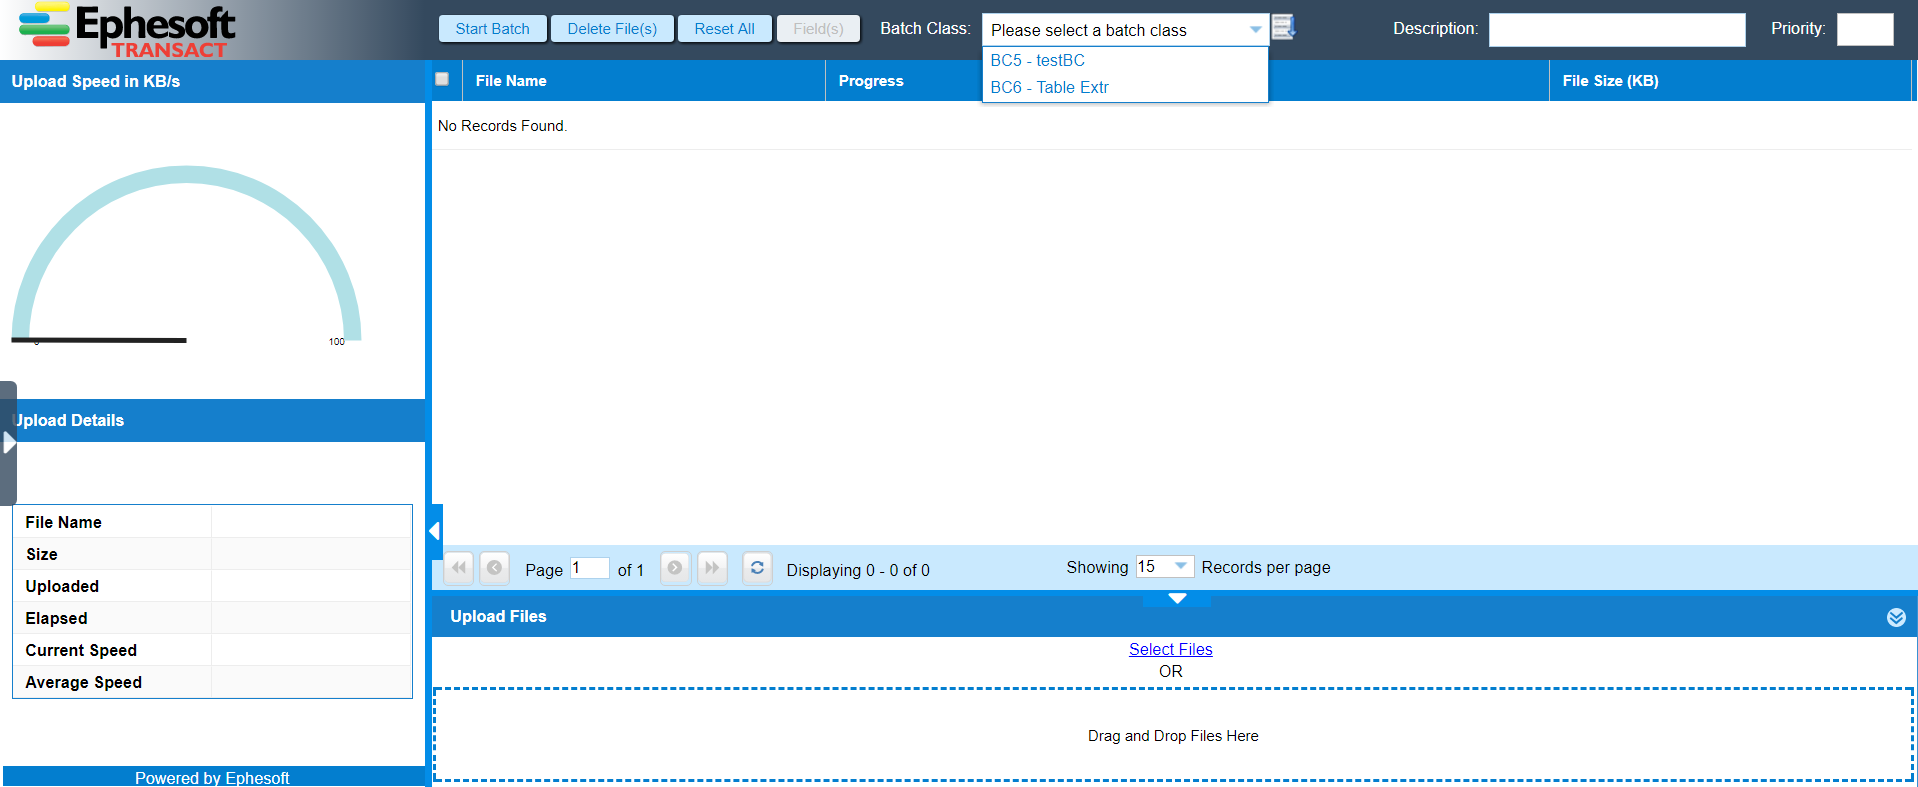 C:UsersEphesoftAppDataLocalMicrosoftWindowsINetCacheContent.Worduser1,2.png